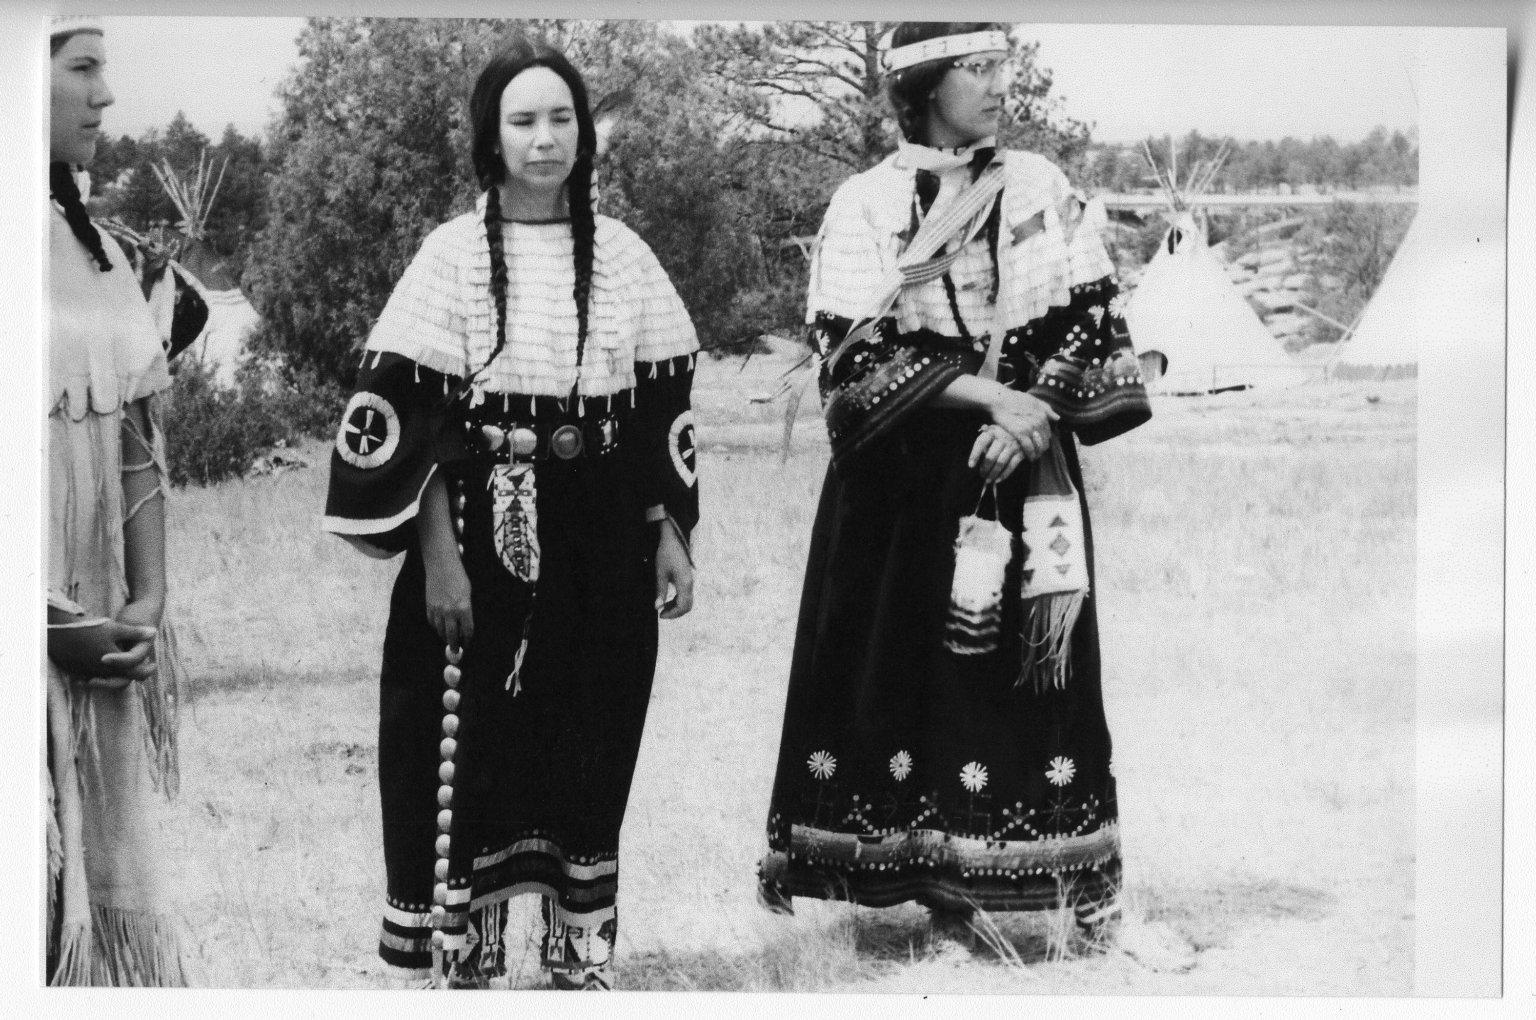 Catherine Eberhart and Wilma Engelhardt